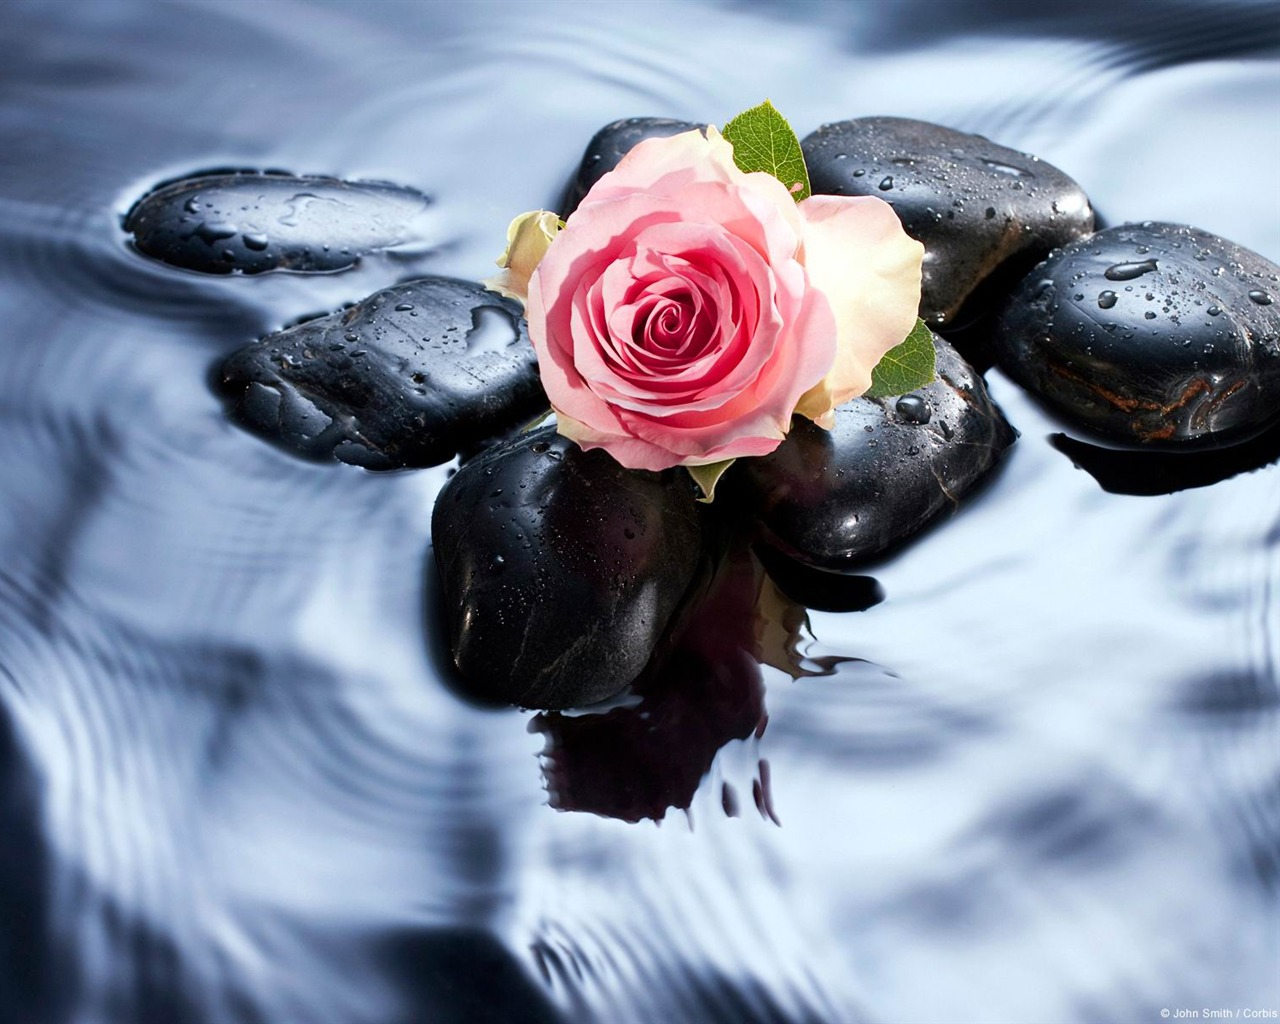 обои на раб стол цветы вода № 635554 бесплатно